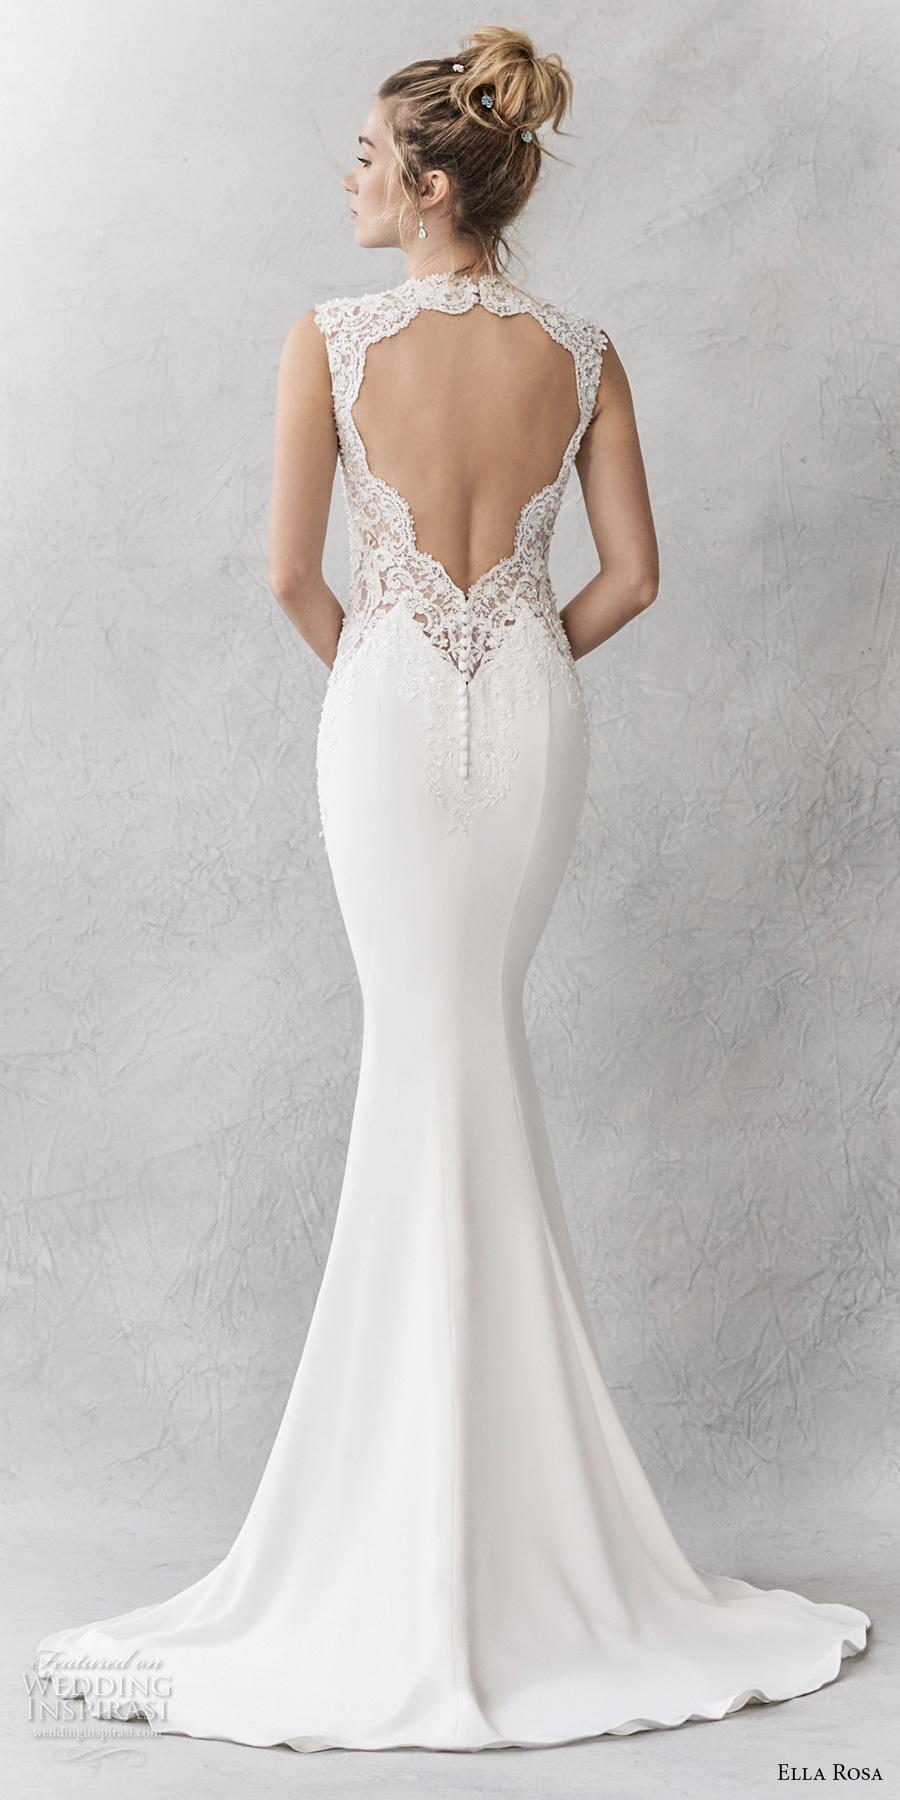 ella rosa spring 2017 bridal sleeveless thick strap sweetheart neckline heavily embellished bodice sheath wedding dress keyhole back sweep train (354) bv